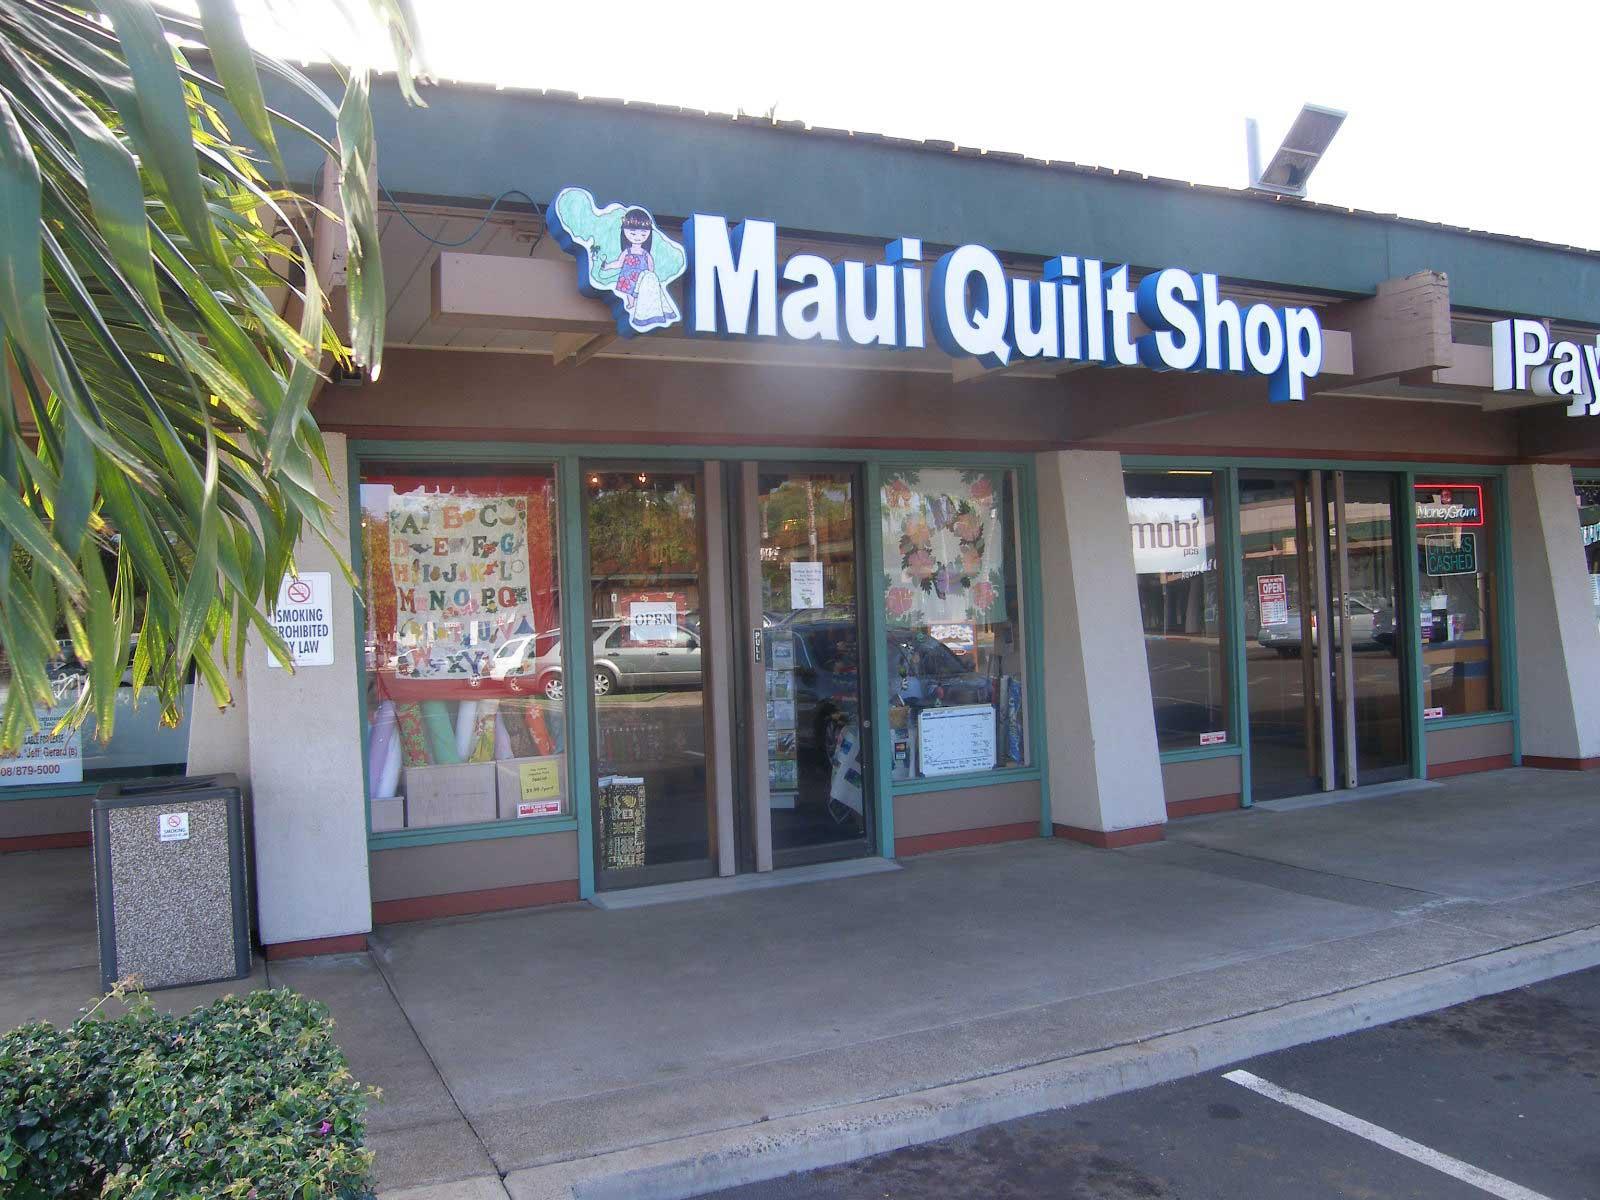 Fabric shopping in Hawaii | I Finally Have Time : honolulu quilt shops - Adamdwight.com